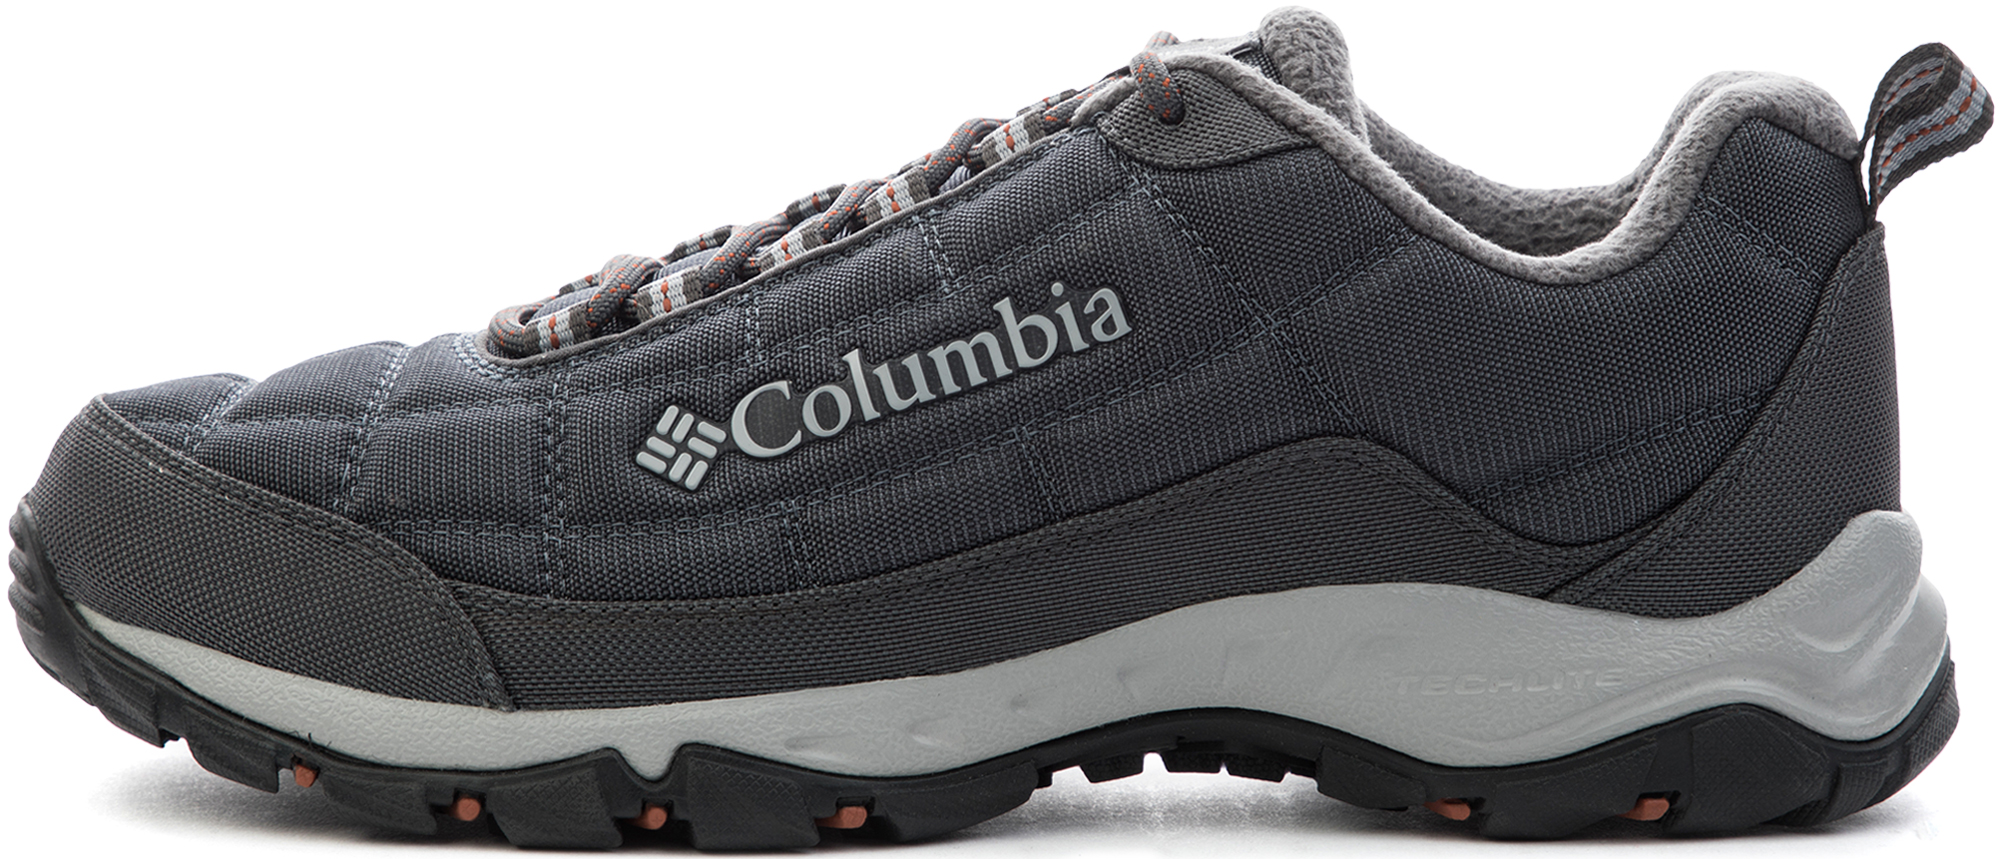 Columbia Ботинки мужские Firecamp, размер 46